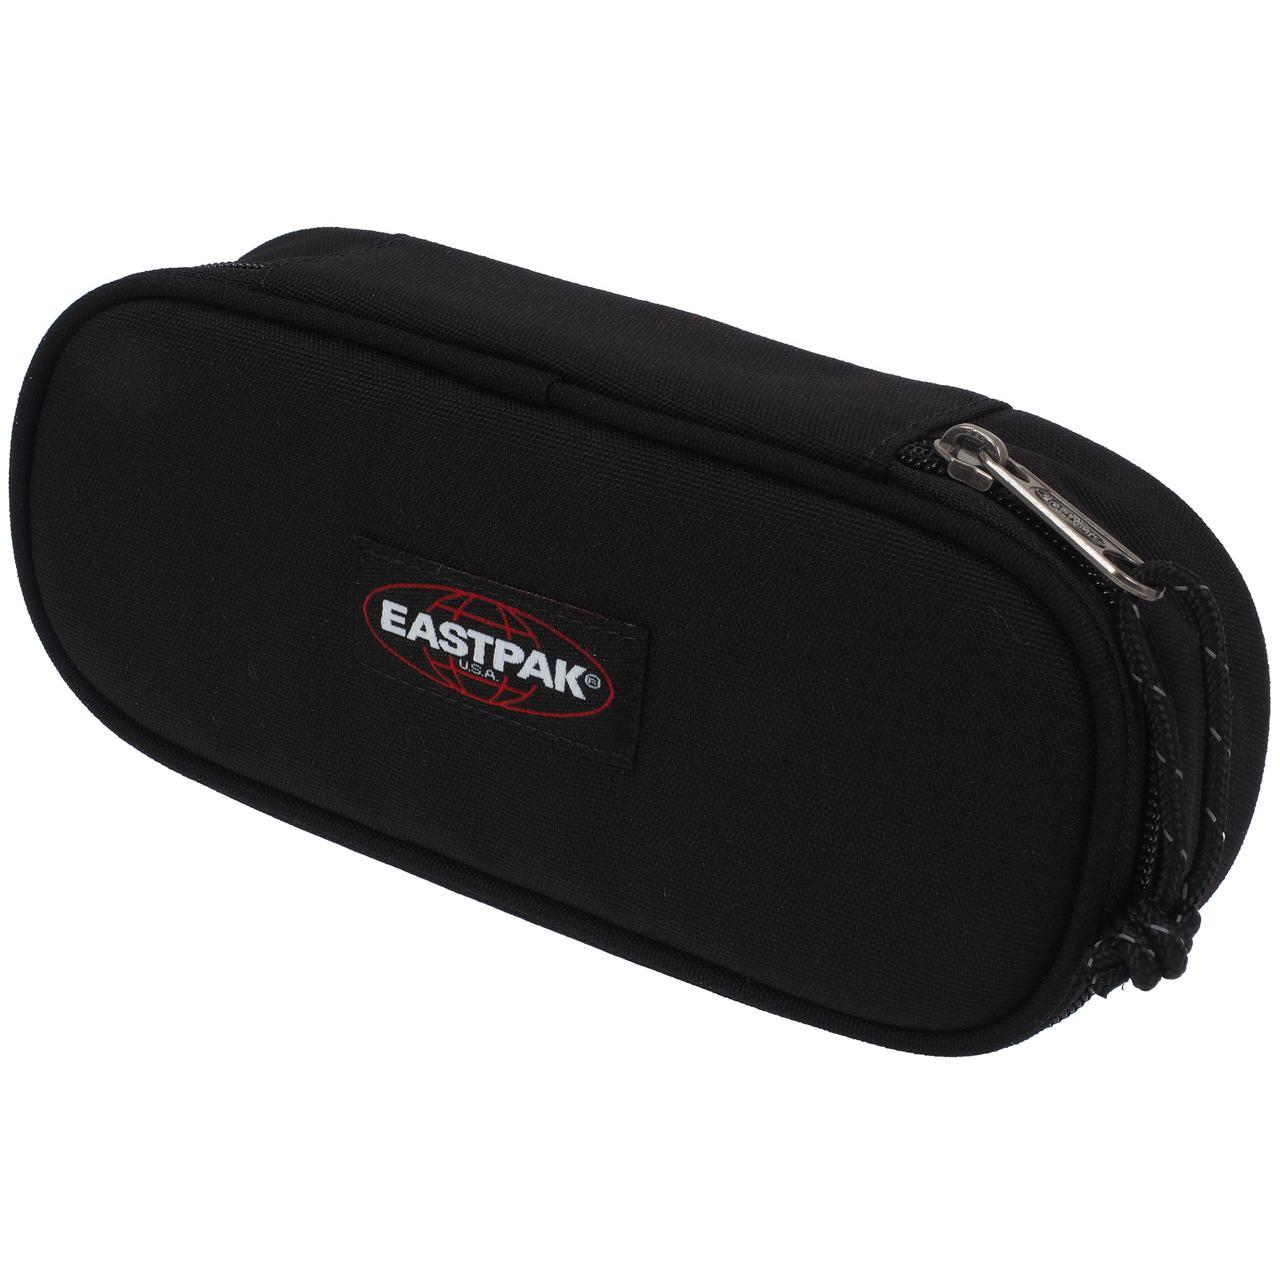 Kit-to-Pencils-Eastpak-Oval-Black-Pencil-Black-28705-New